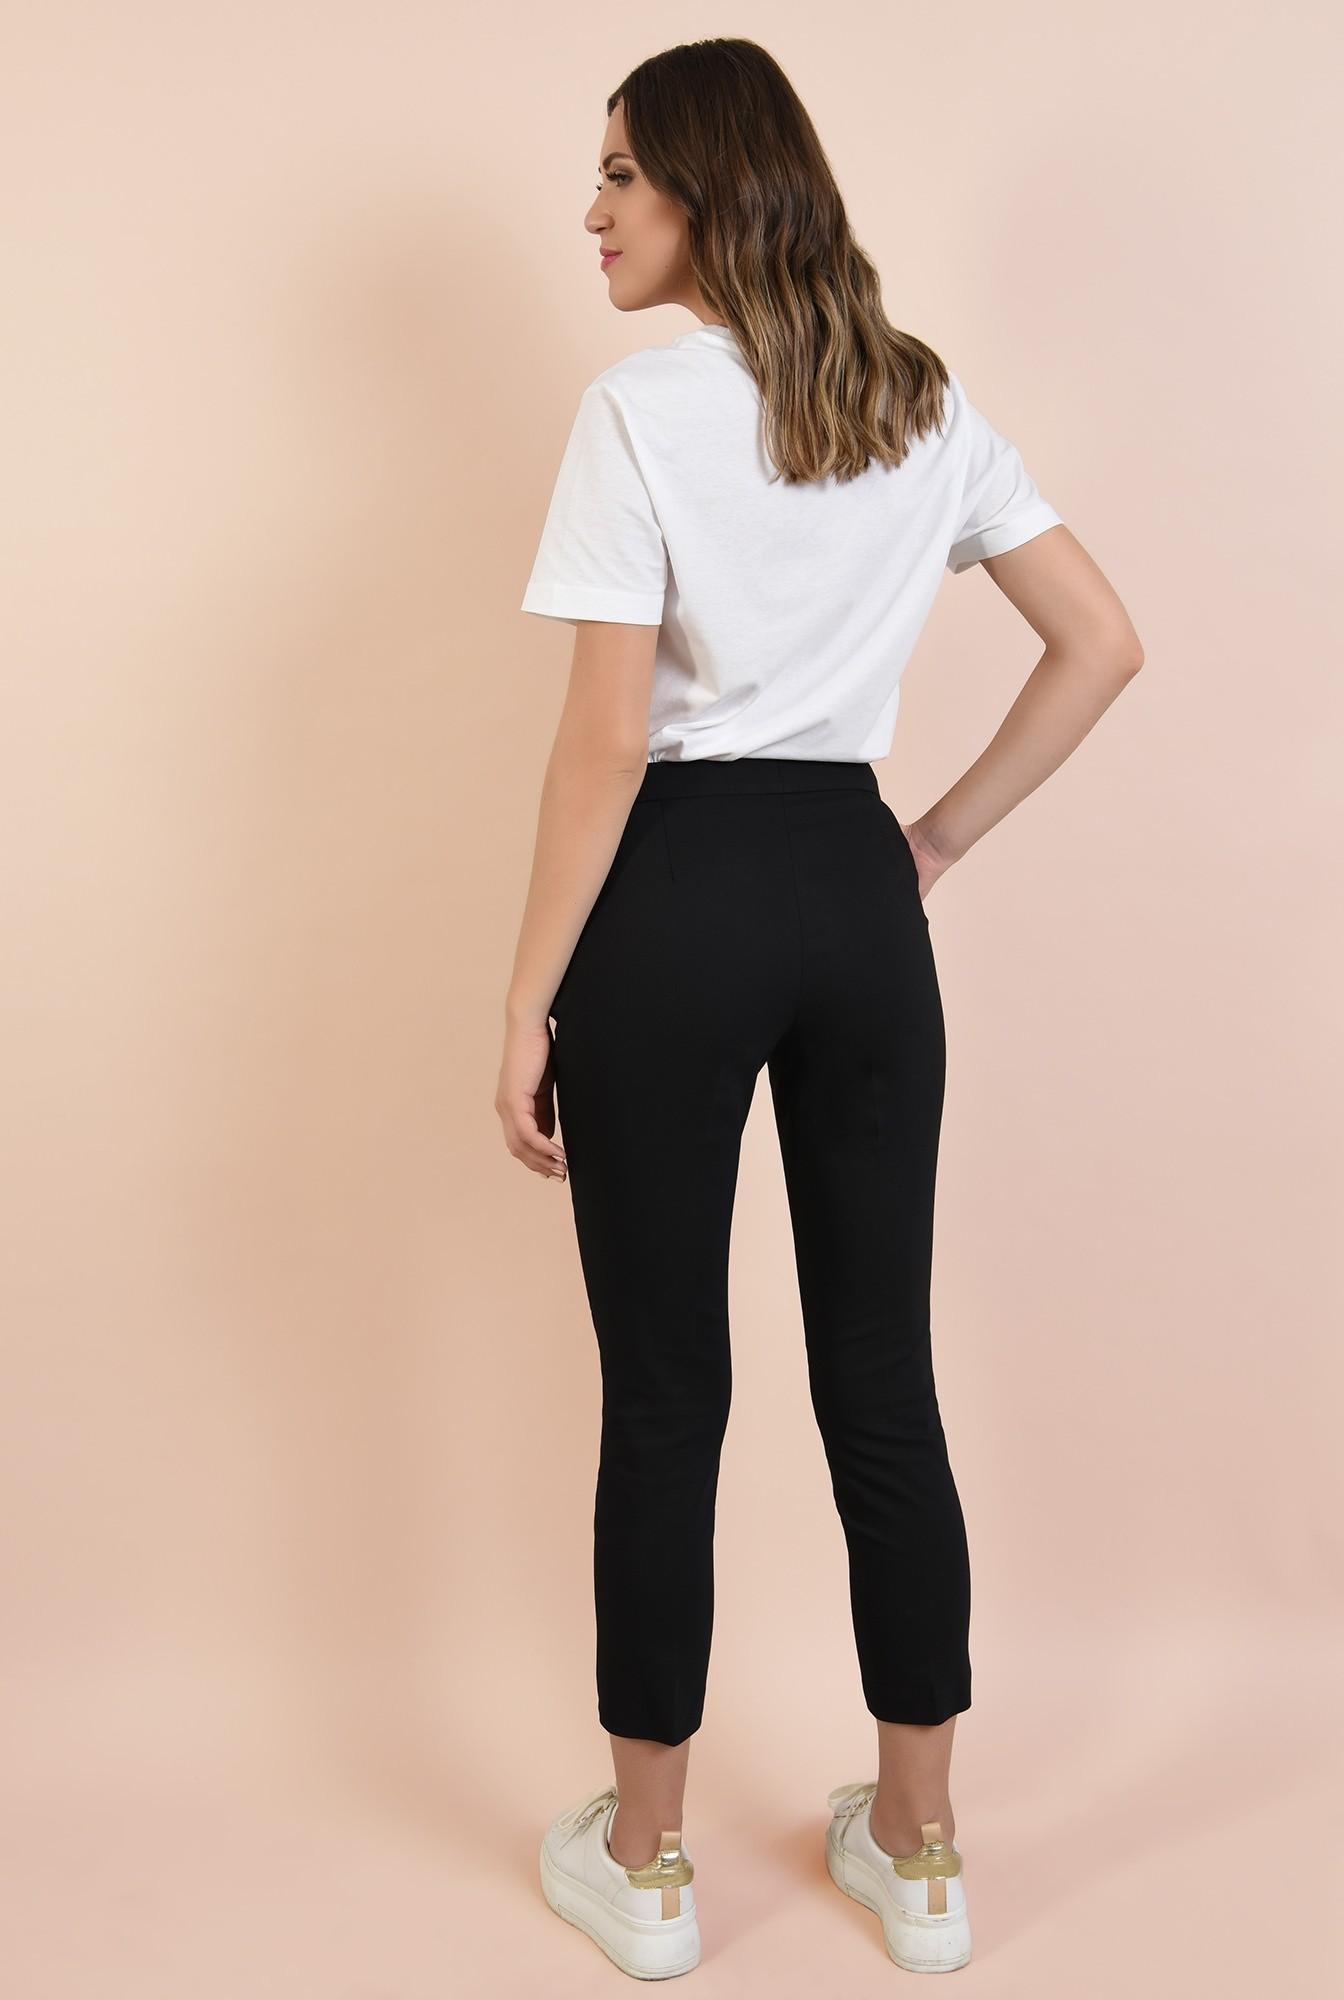 1 - 360 - pantaloni conici, cu buzunare in cusatura, casual, Poema